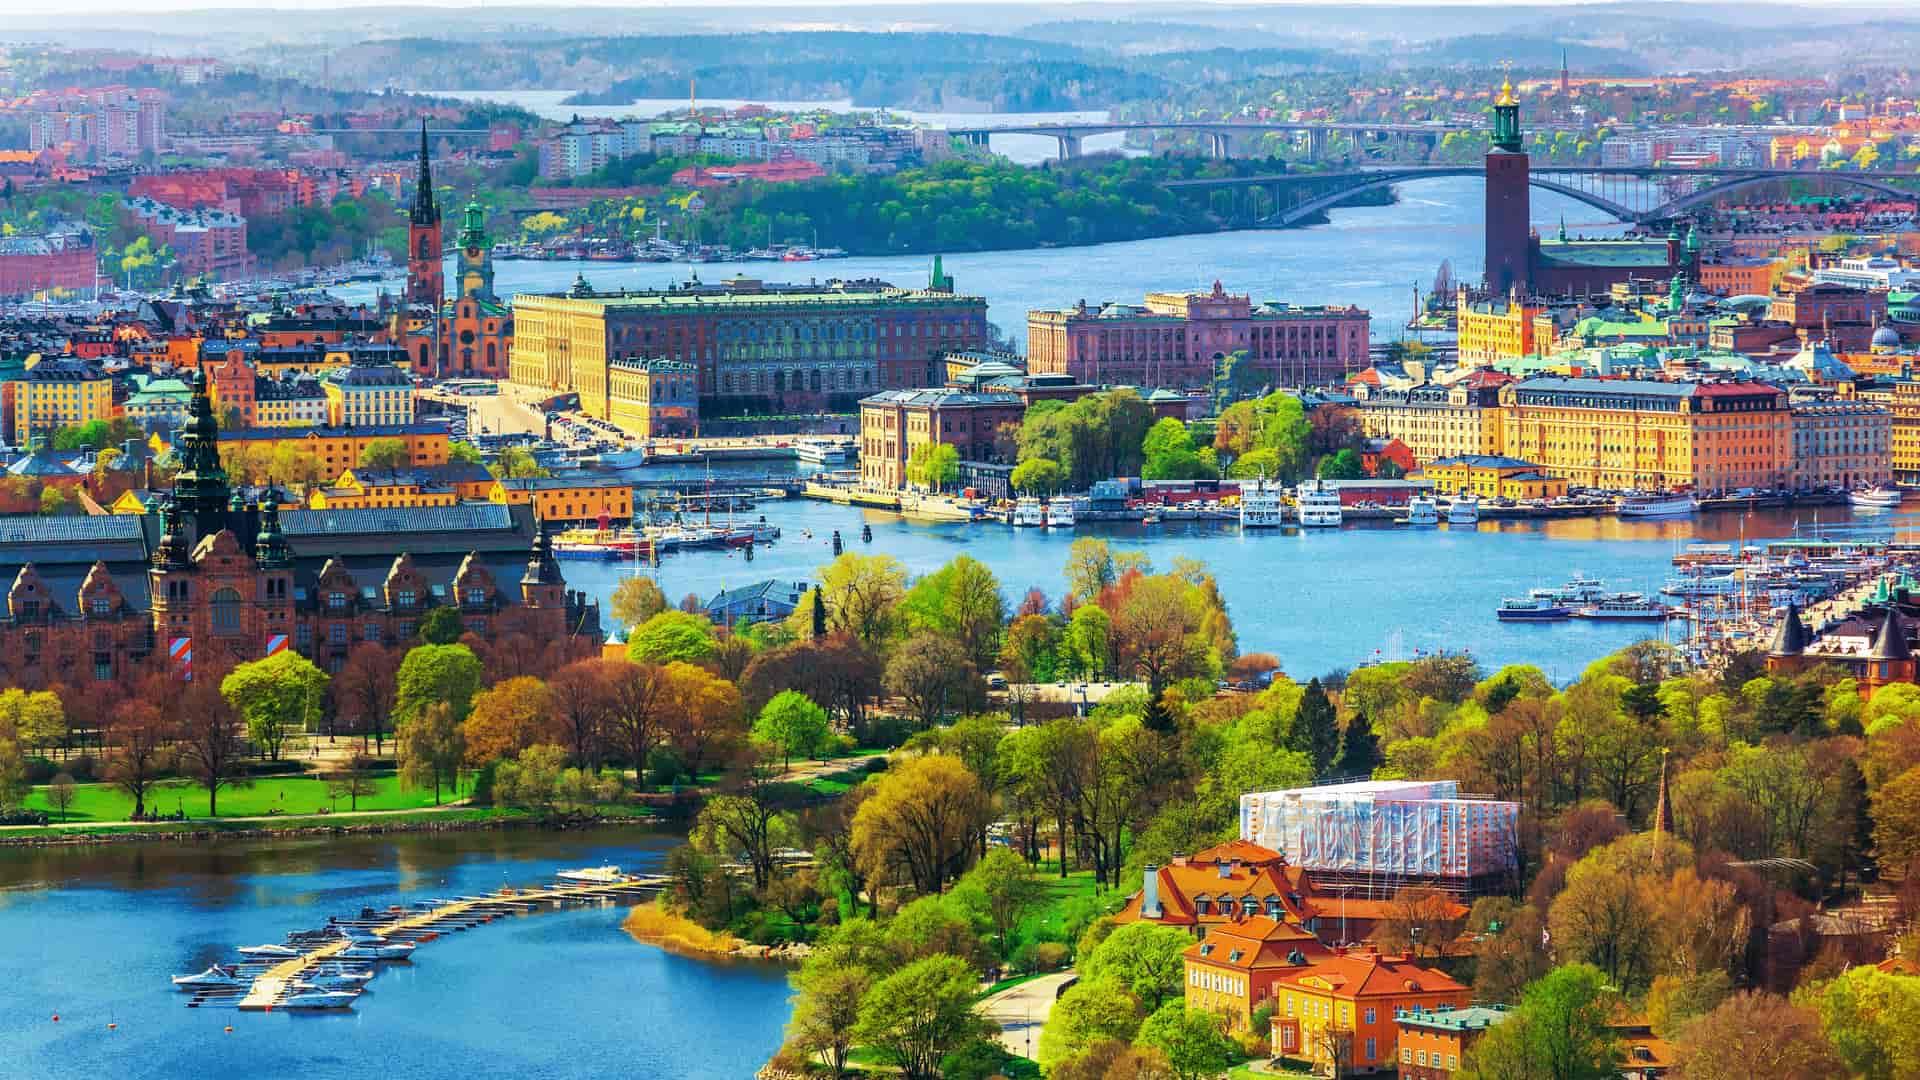 Criptomoneda de Suecia: así será la e-Krona